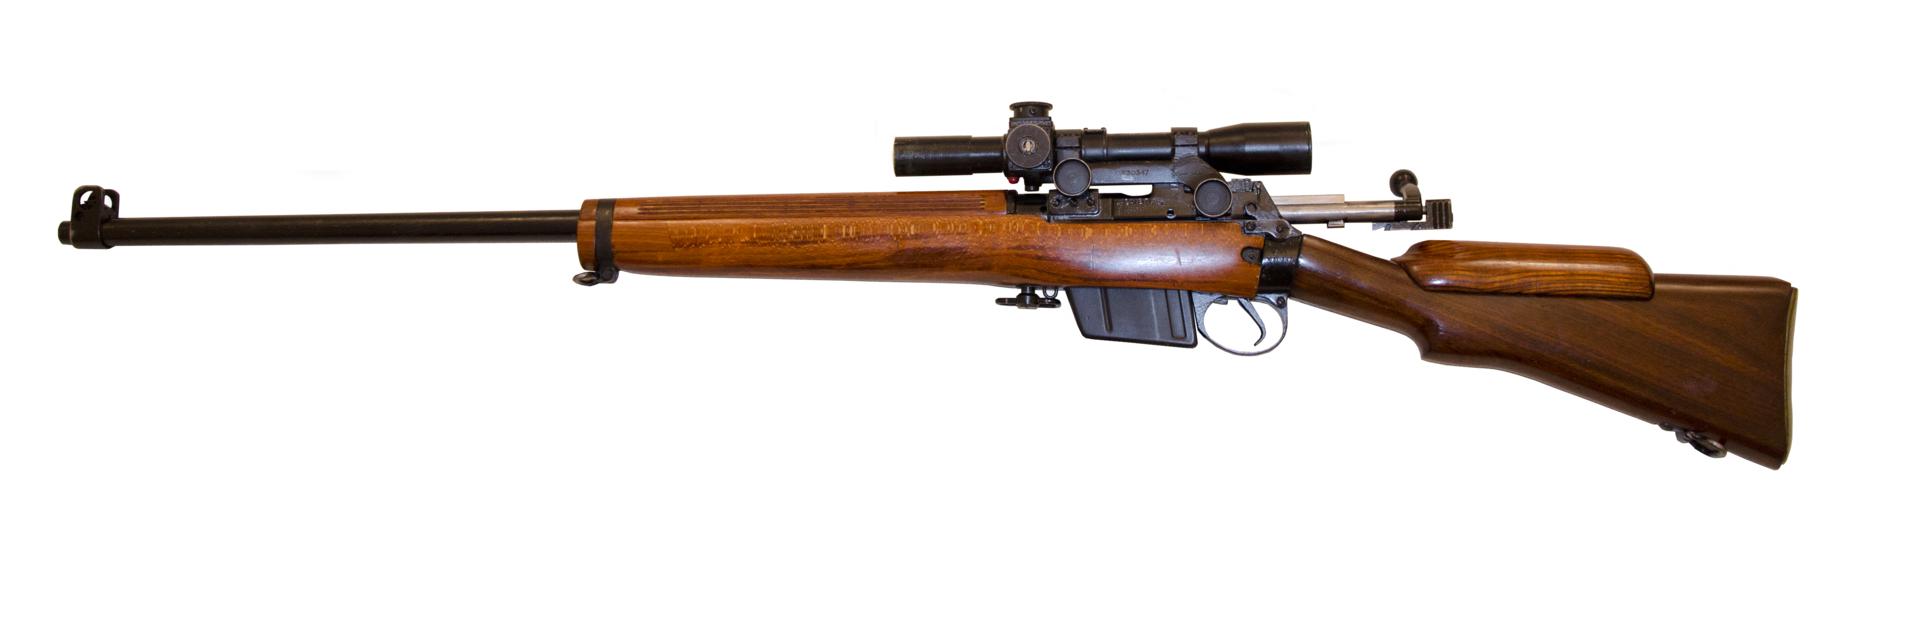 L42A1 Sniper Rifle